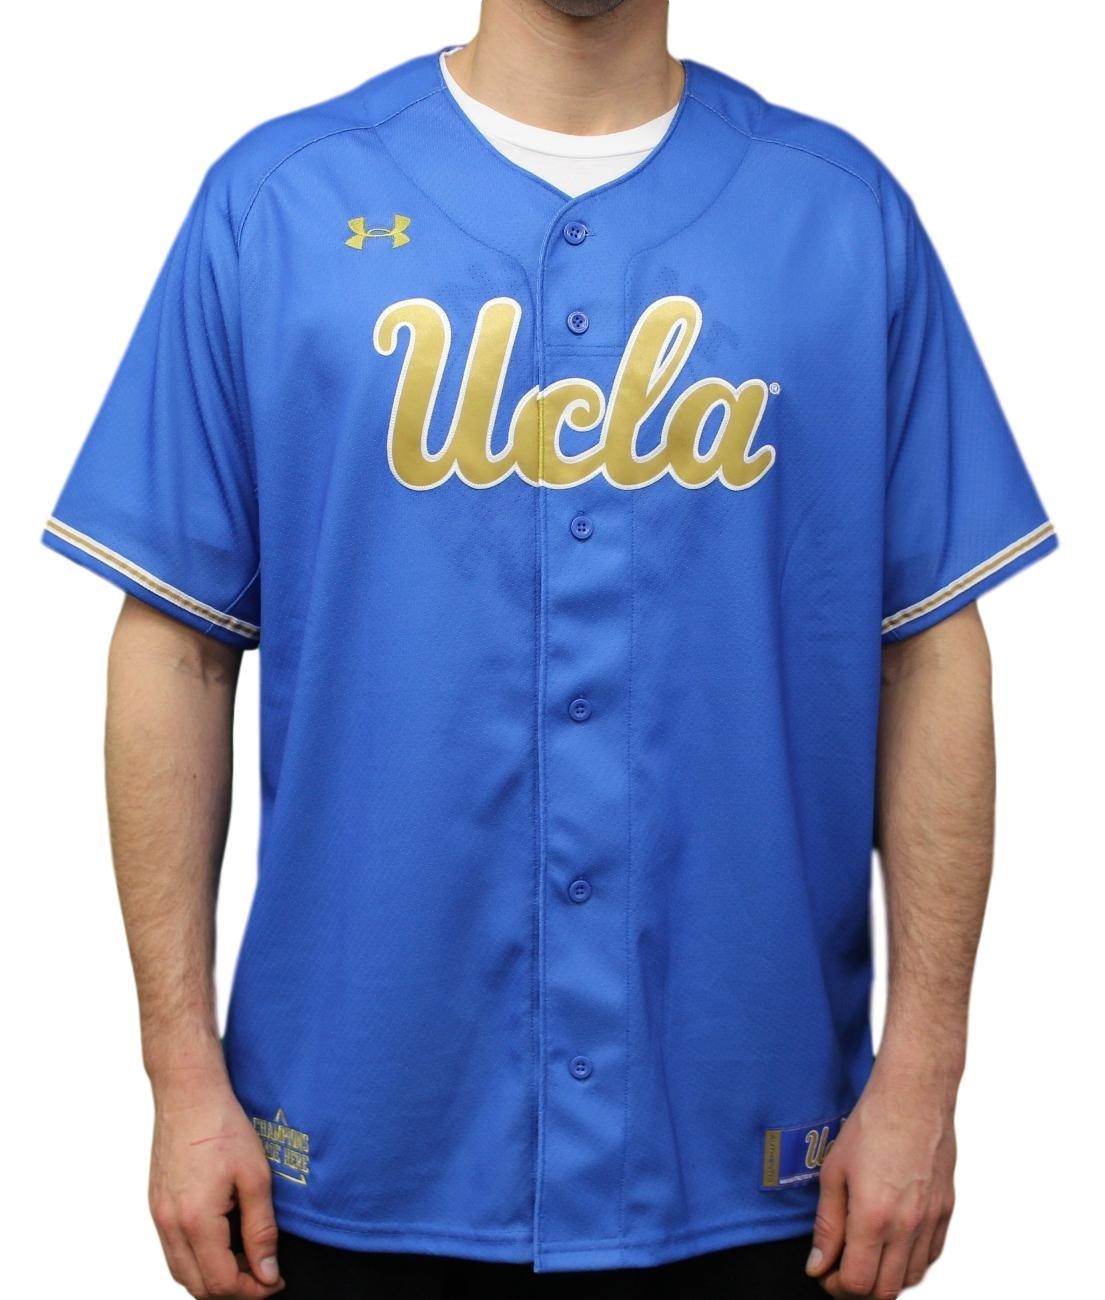 timeless design 6d777 31119 Amazon.com : Under Armour UCLA Bruins NCAA Men's Baseball ...